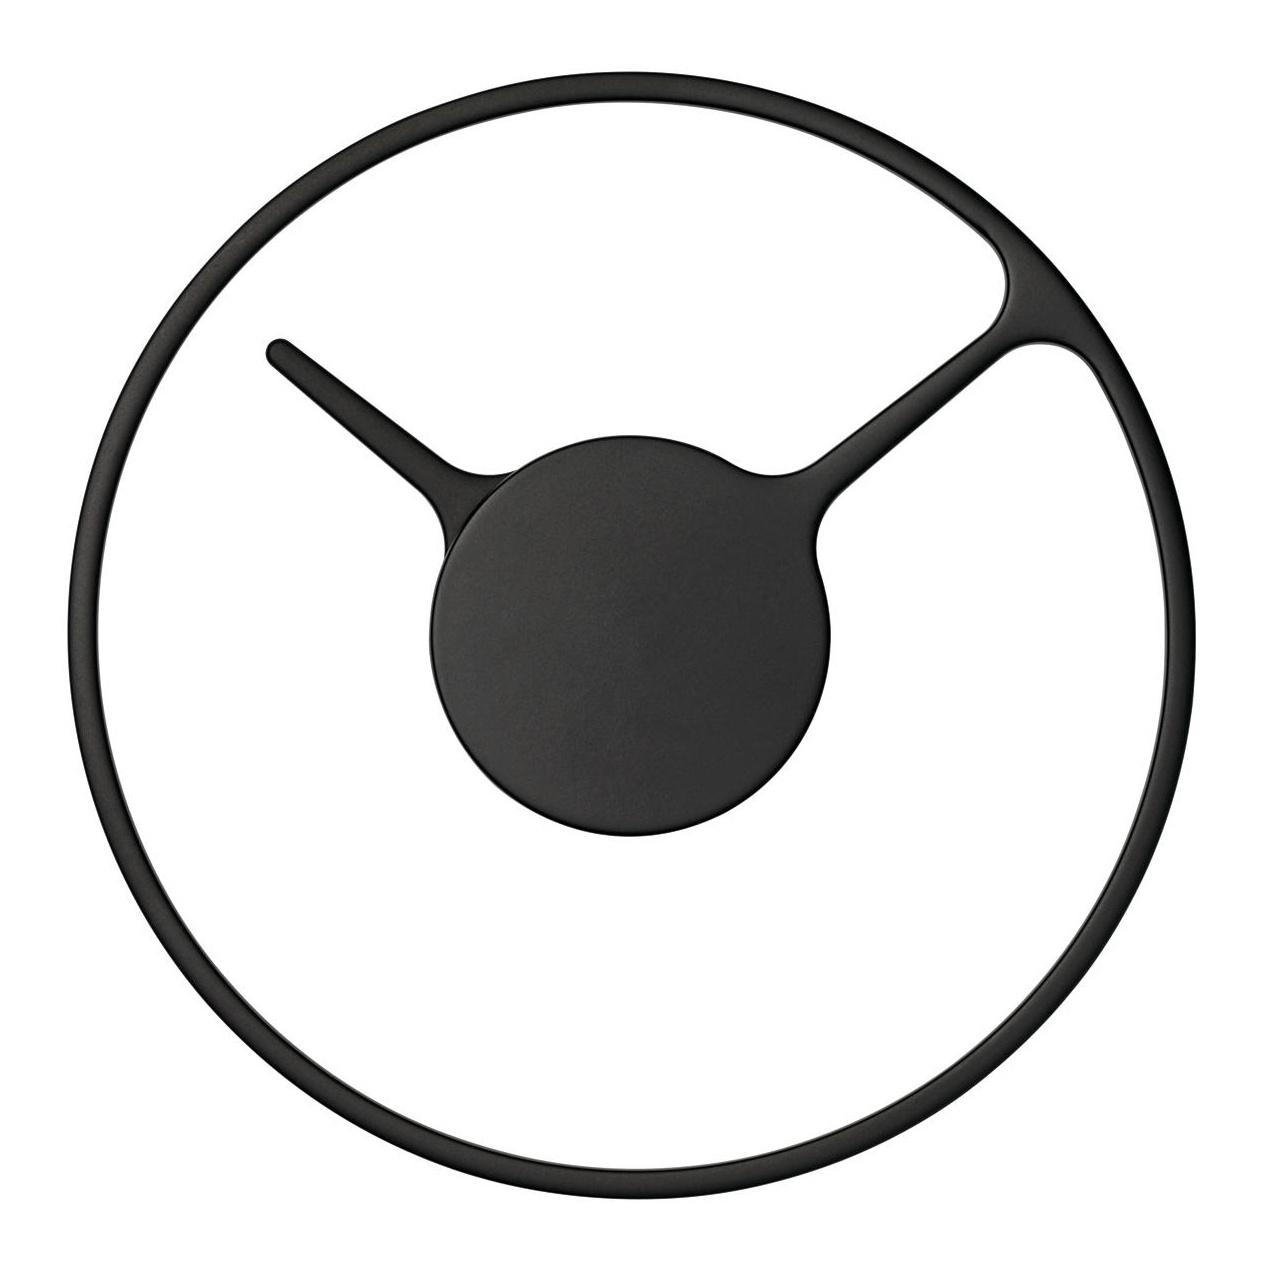 Stelton Time Wanduhr - schwarz/Ø 30cm | Dekoration > Uhren > Wanduhren | Stelton